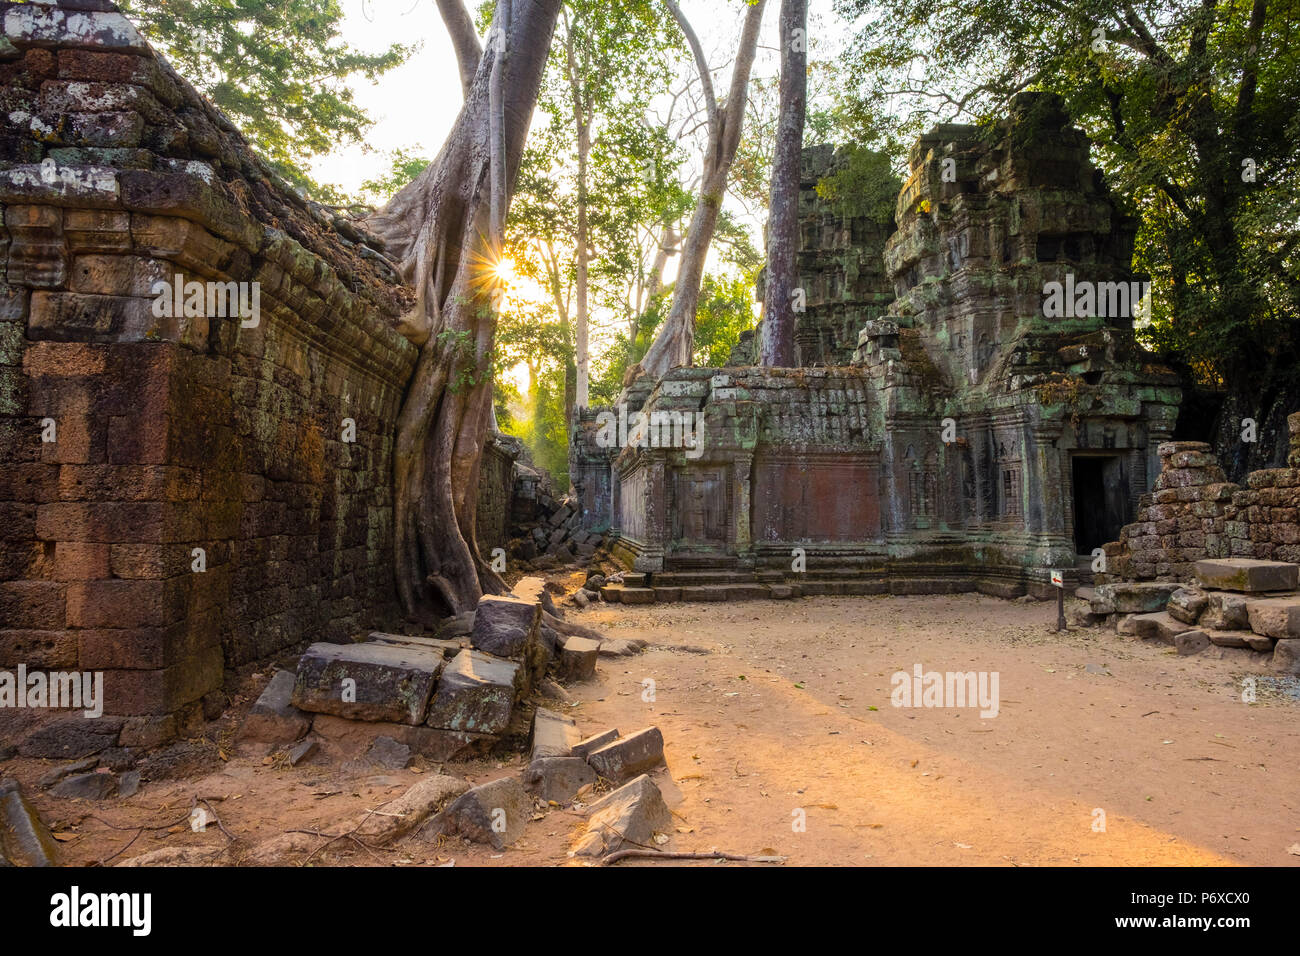 Ta Prohm temple (Rajavihara), Angkor, UNESCO World Heritage Site, Siem Reap Province, Cambodia Stock Photo